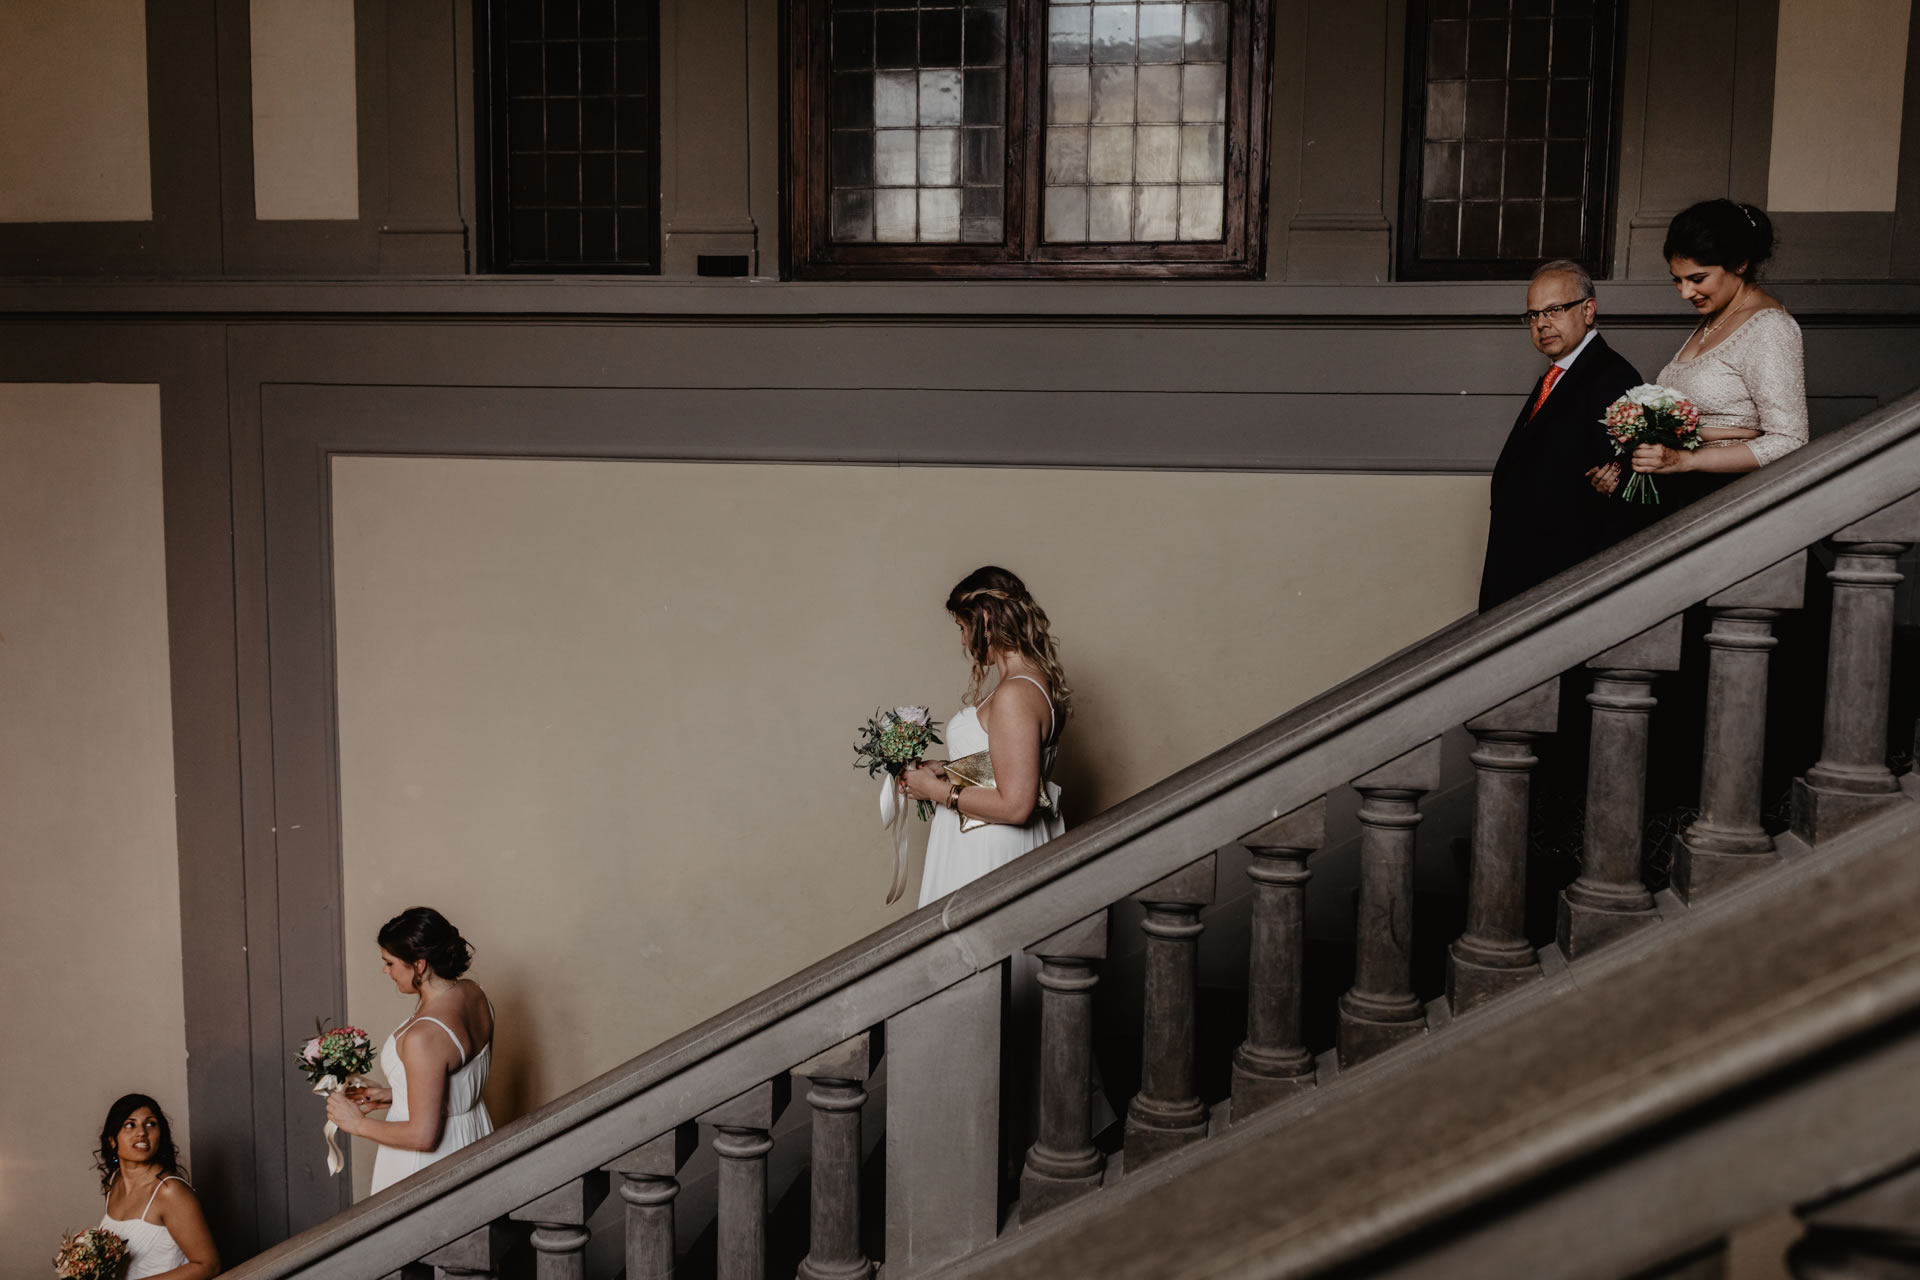 - 40 :: Indian wedding ceremony at Villa Pitiana :: Luxury wedding photography - 39 ::  - 40